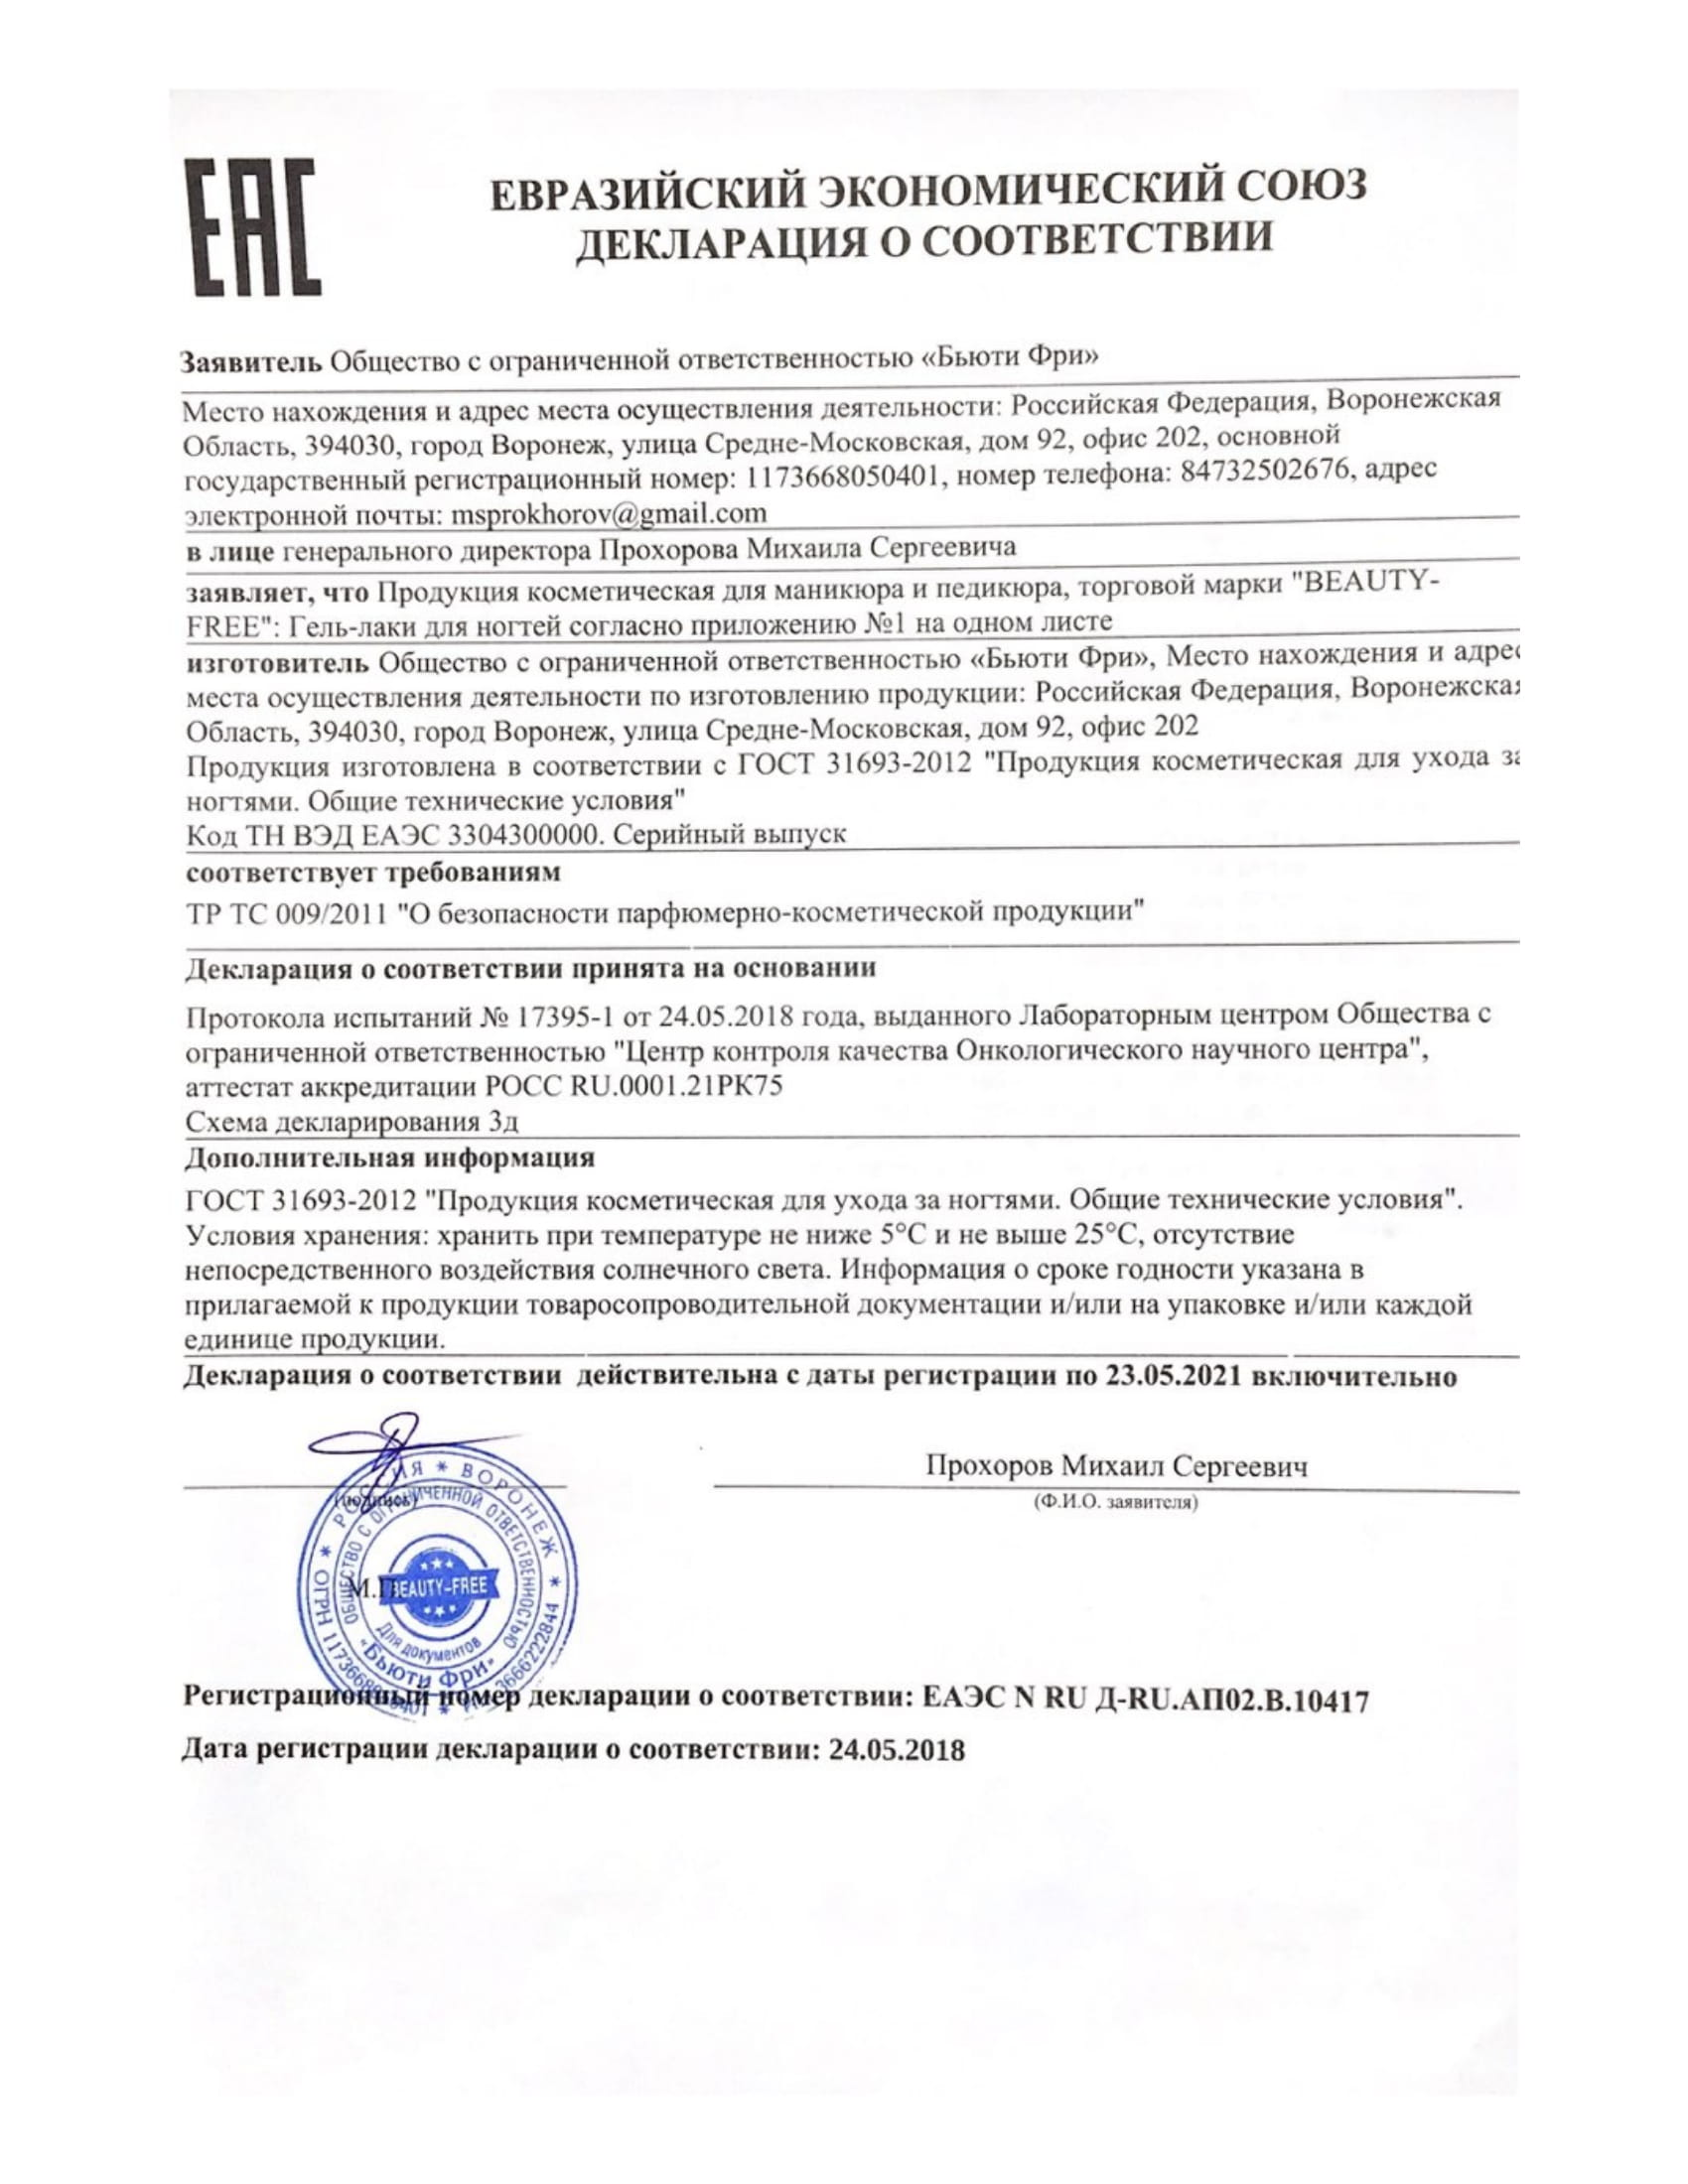 ЕАЭС N RU Д-RU.АП02.В.10417-1